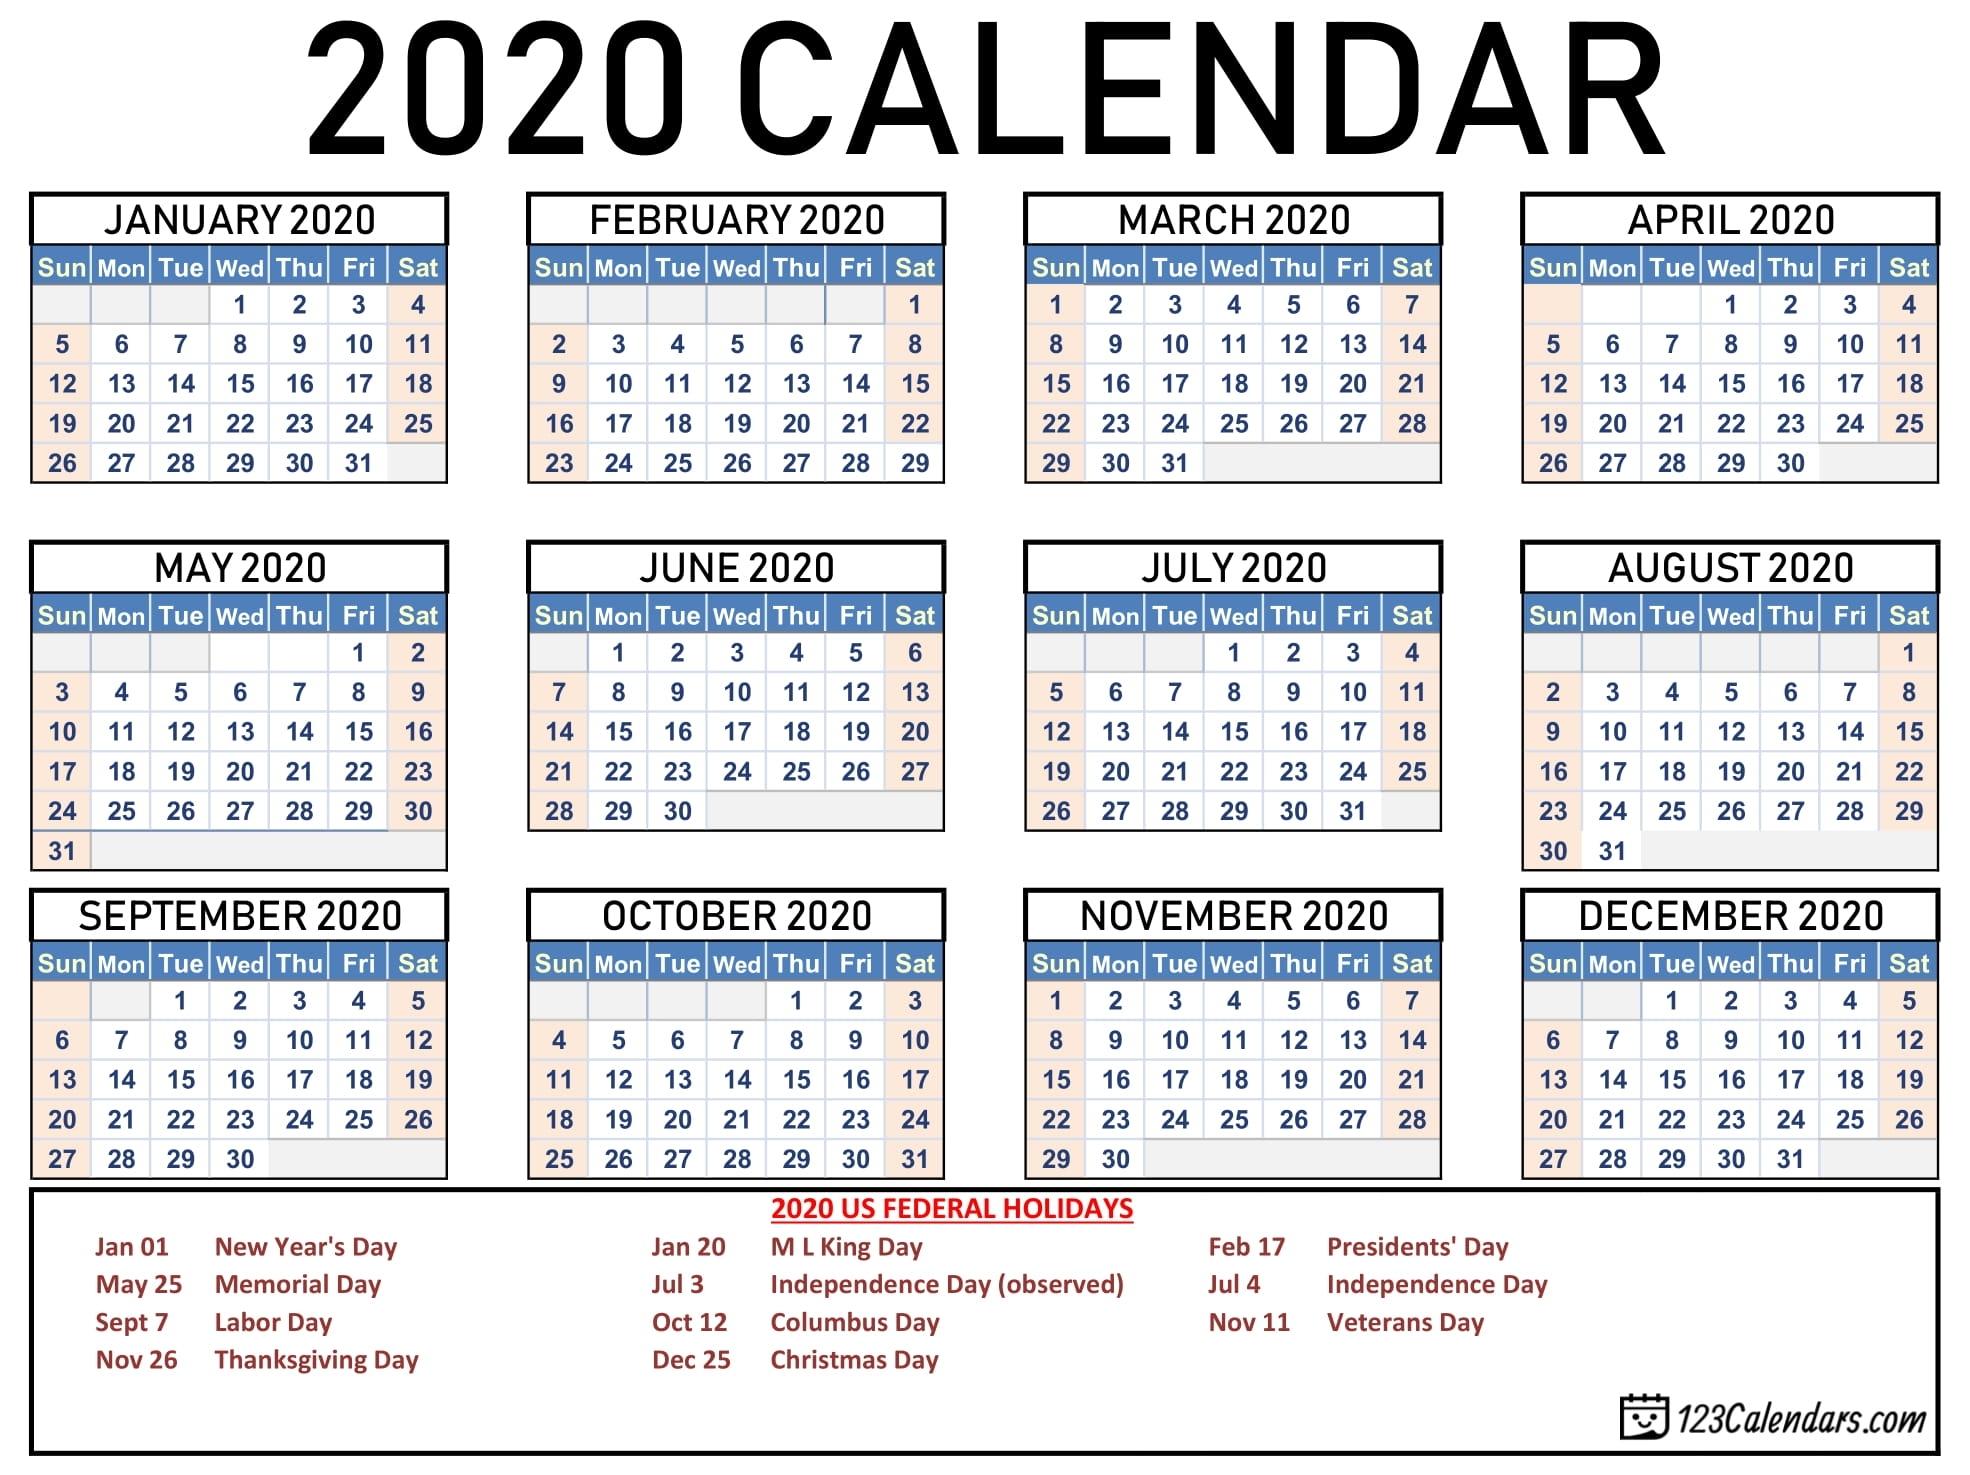 Free Printable 2020 Calendar | 123Calendars pertaining to Pocket Size Calendar Free Printable